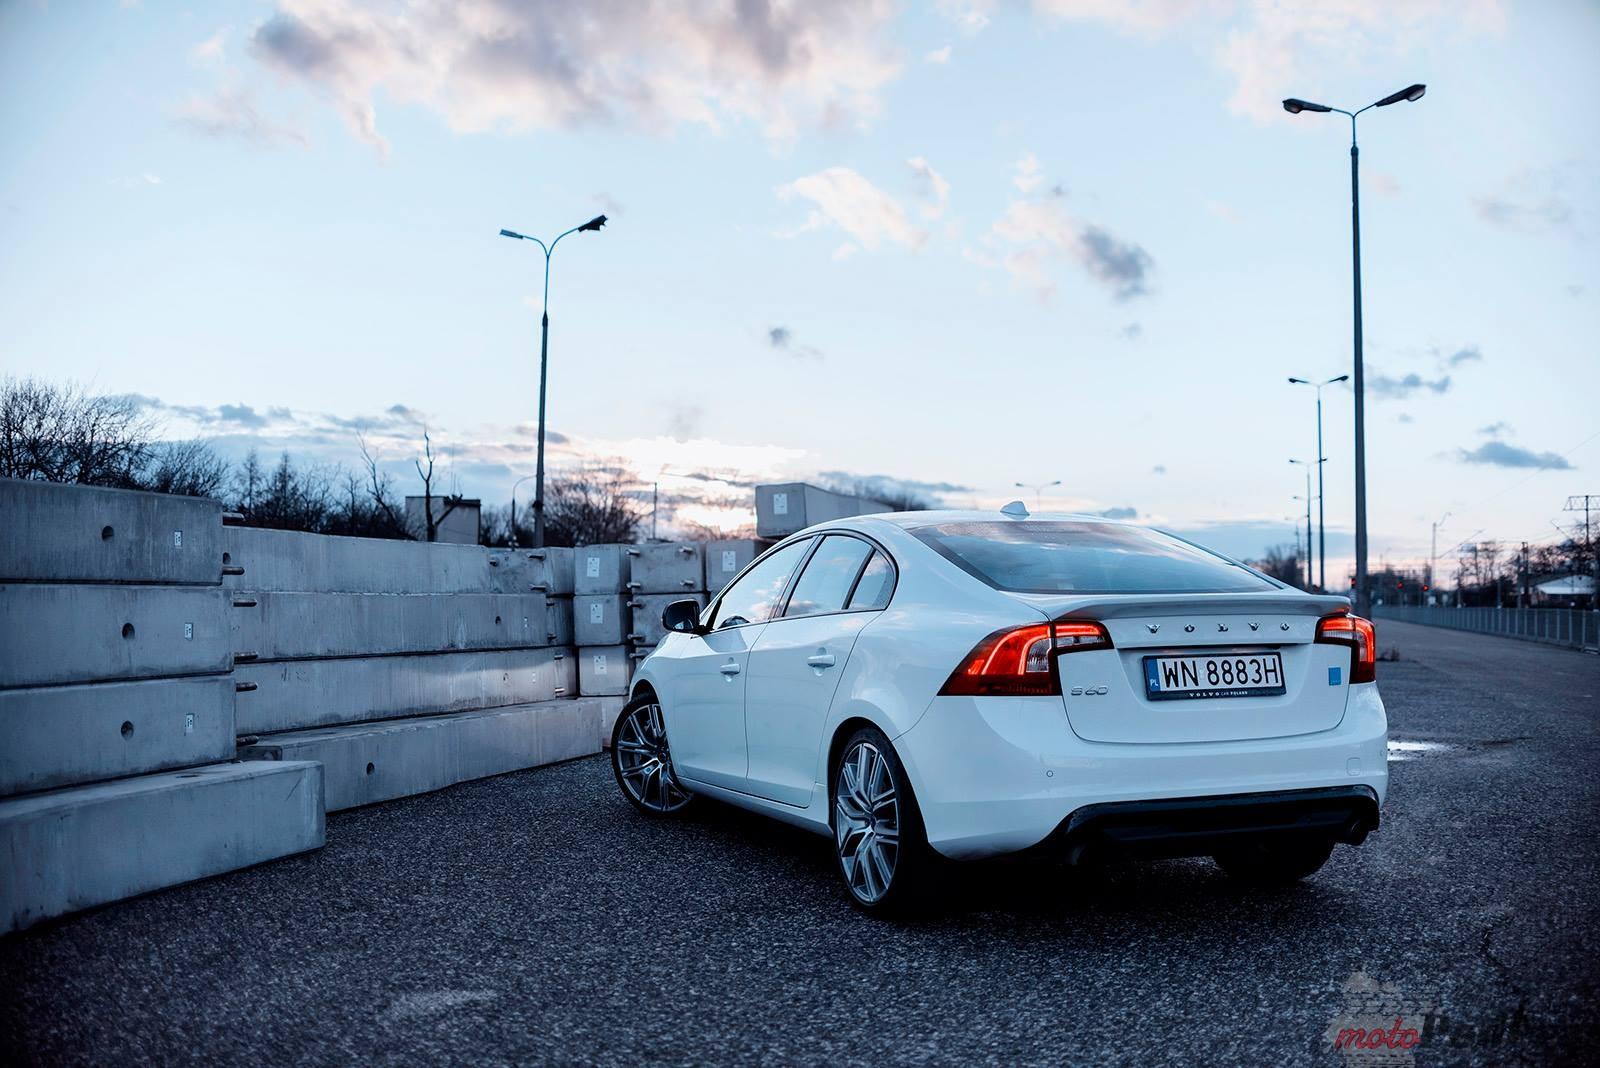 Volvo S60 Polestar 12 Test: Volvo S60 Polestar   powiało chłodem